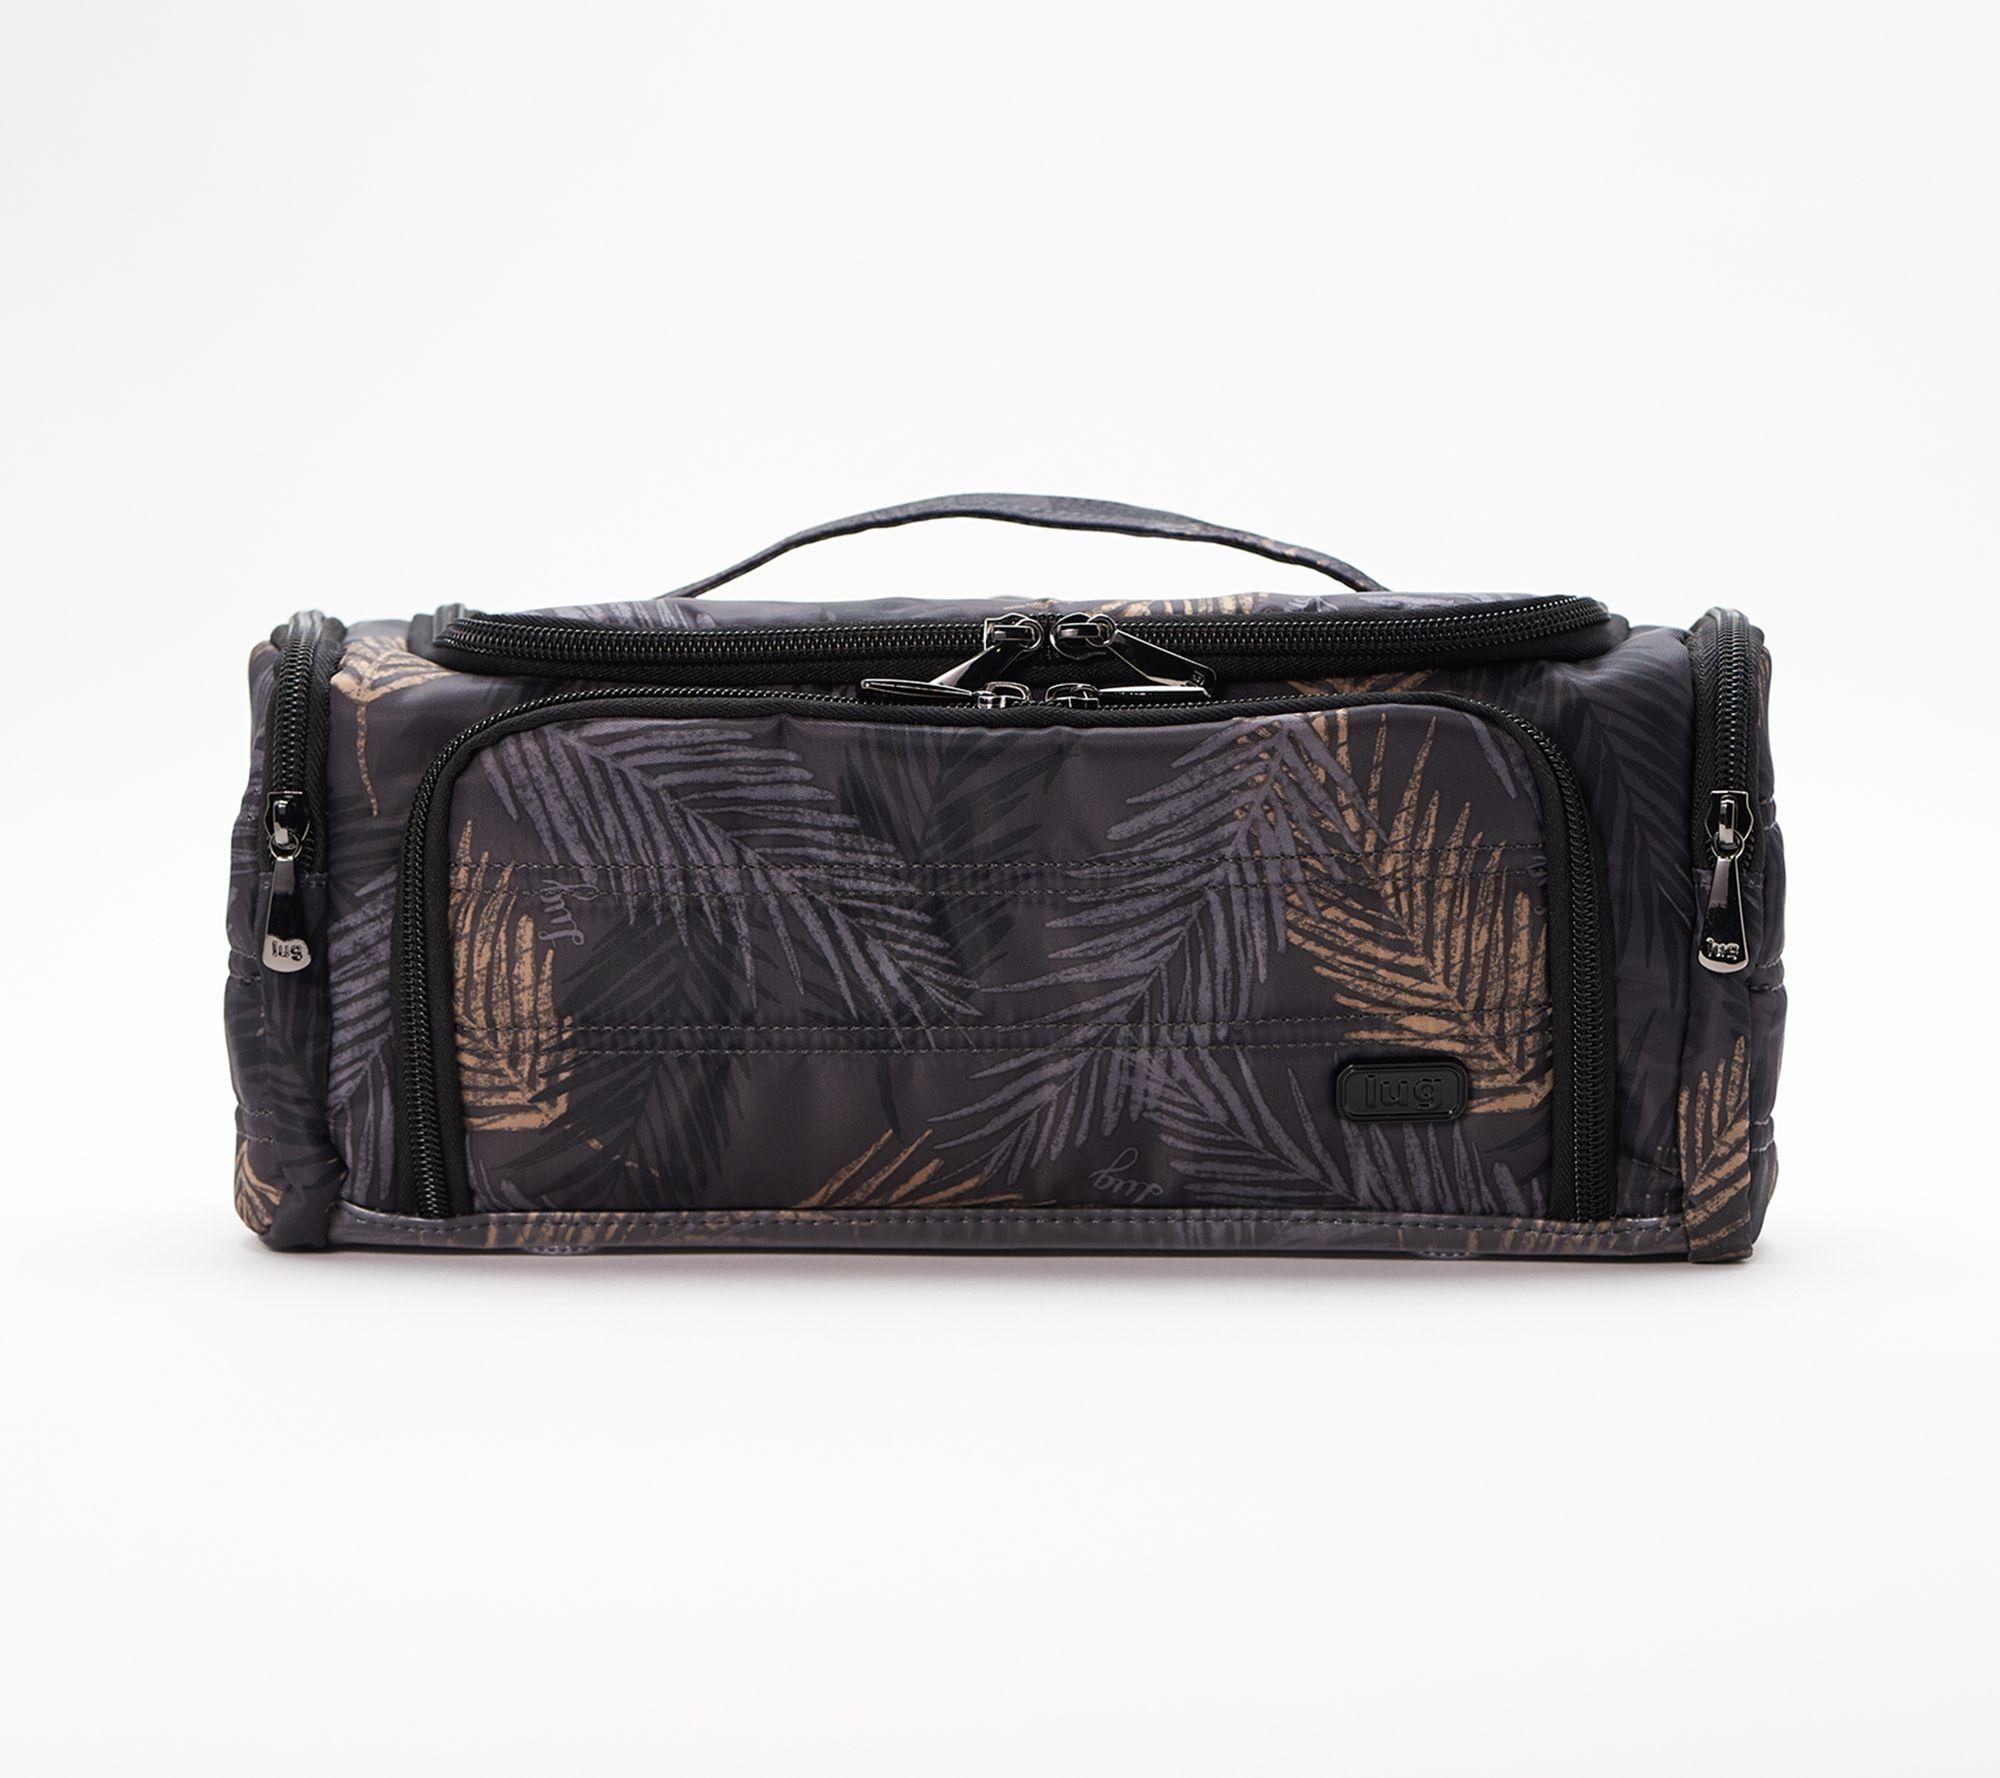 eef67a15fe45 Lug Cosmetic Case -Trolley - Page 1 — QVC.com